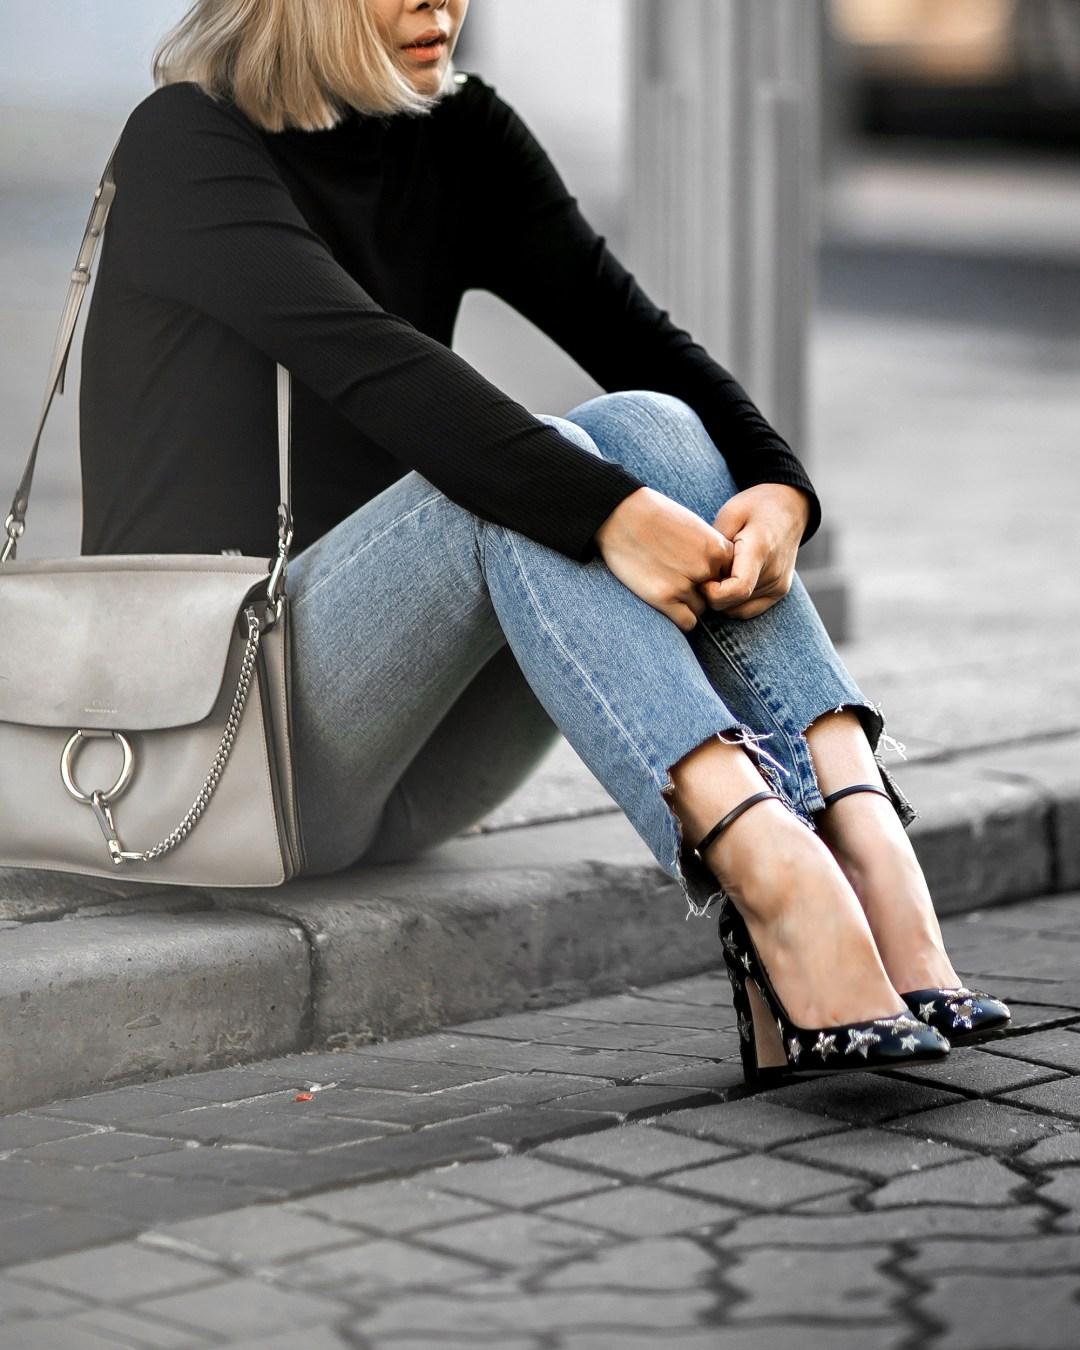 valentino-tango-stars-farfetch-stepped-hem-jeans-outfit-inspiration-13-copy